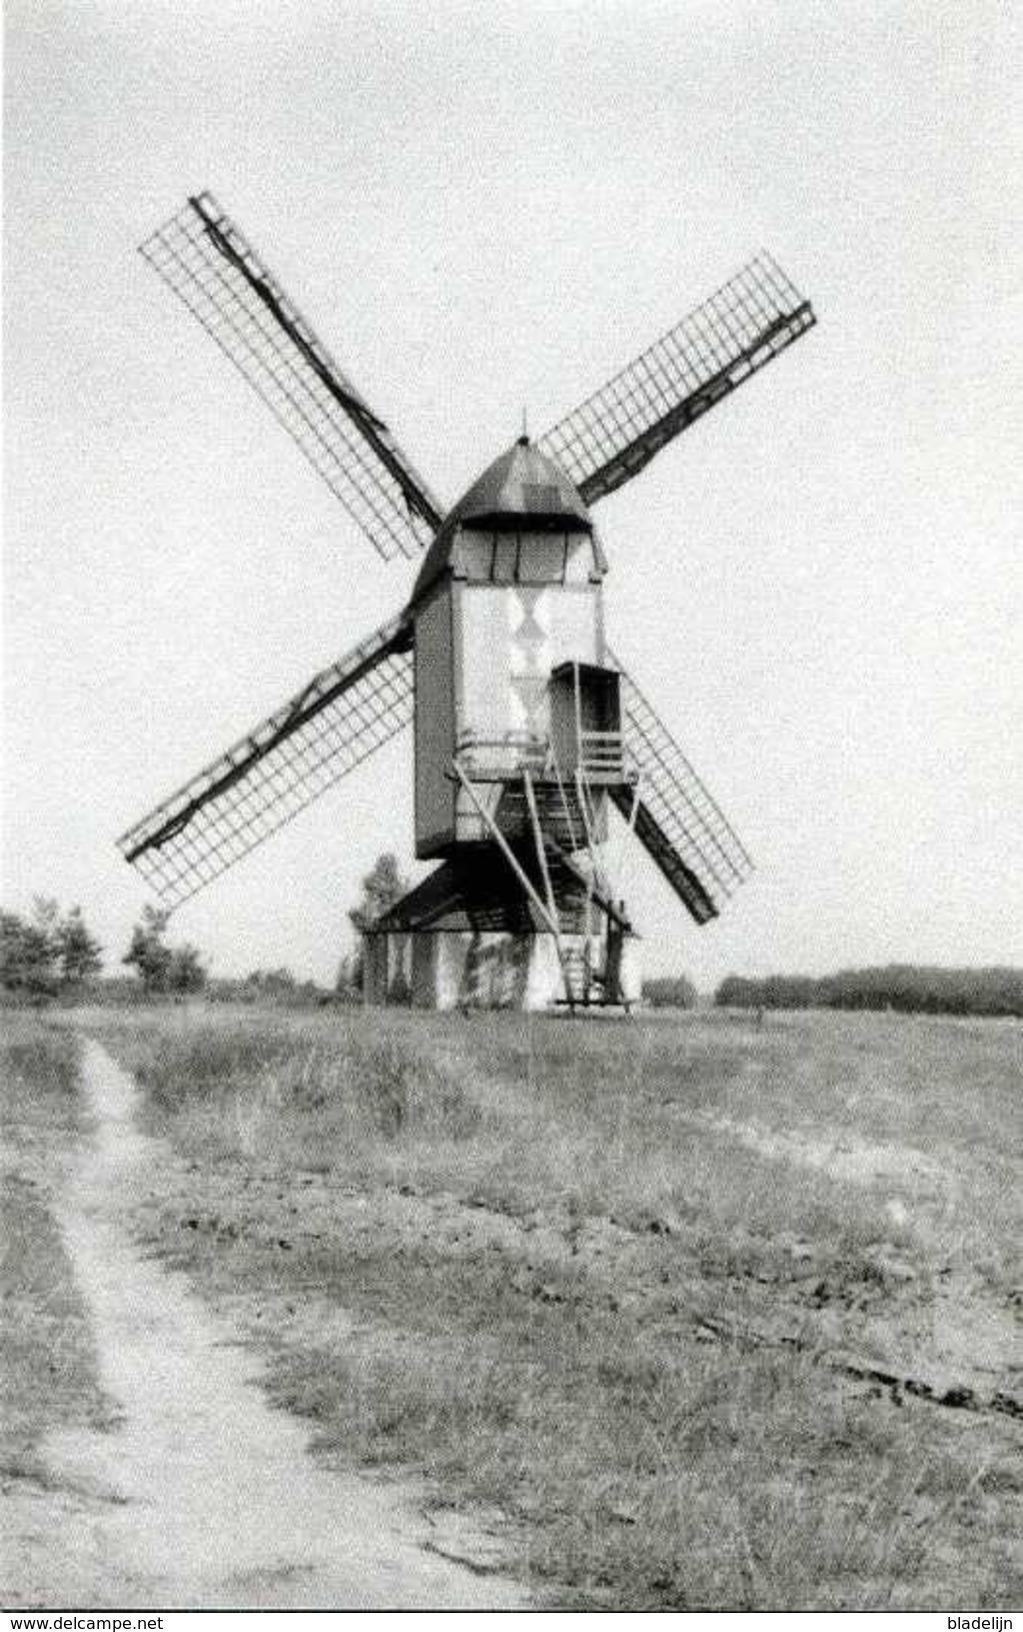 SINT-OEDENRODE - Meierijstad (N.Br.) - Molen/moulin - De Verdwenen Koeveringse Standerdmolen Omstreeks 1930 - Zonder Classificatie